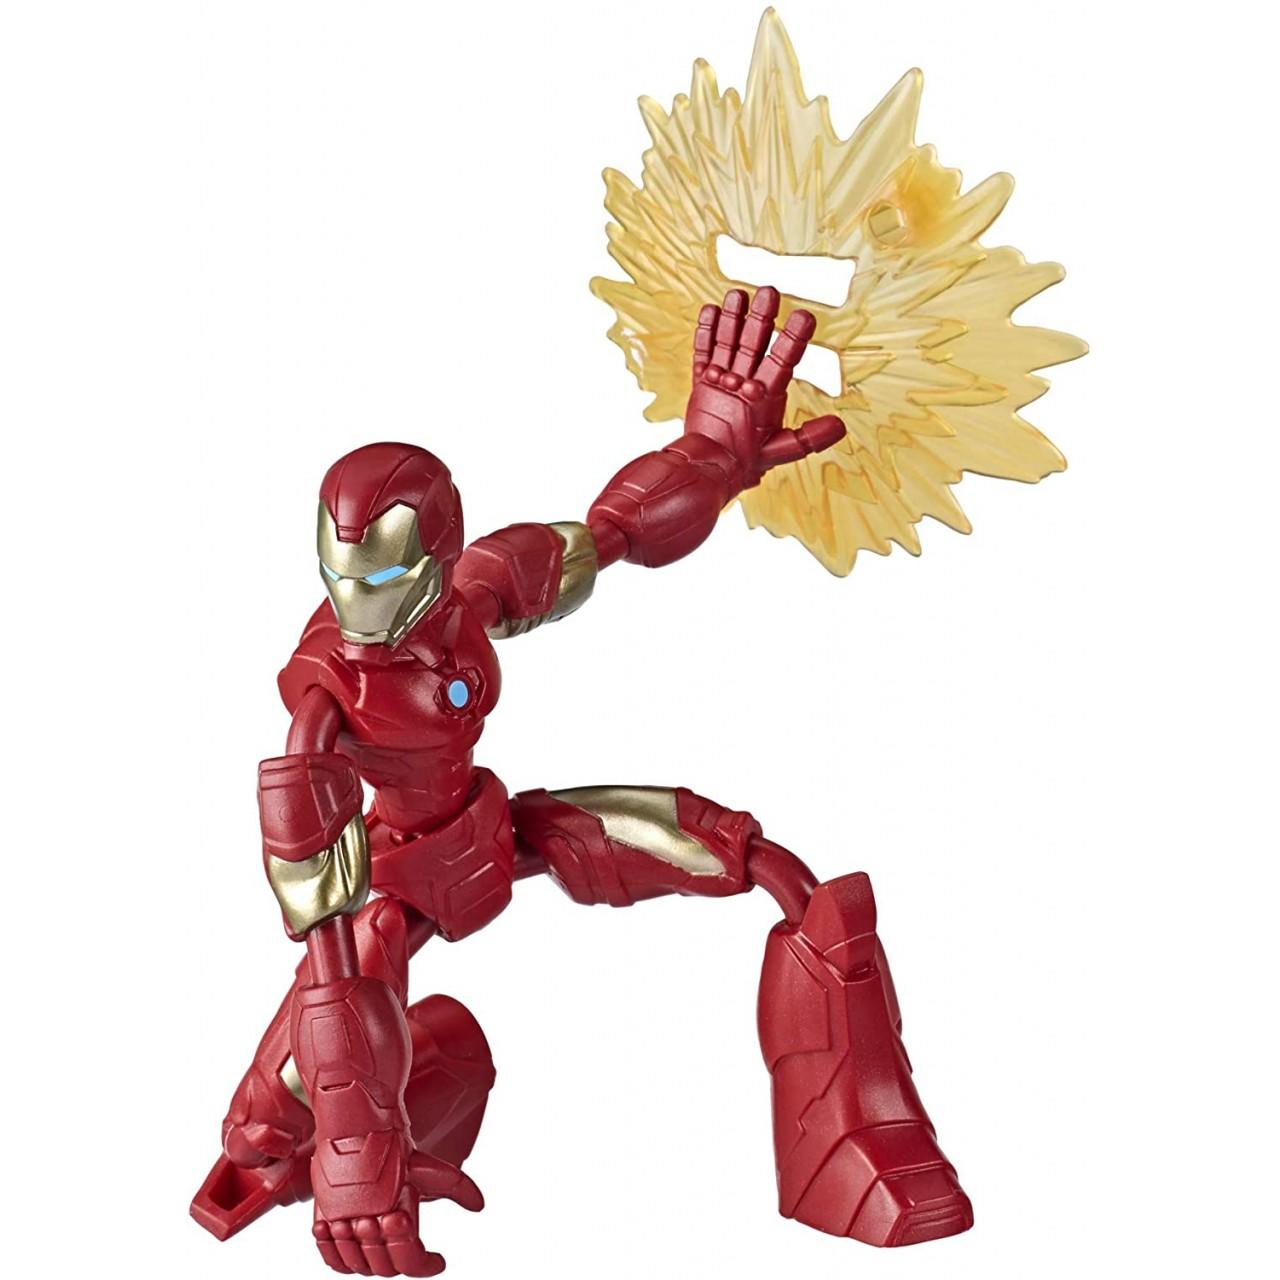 Игровая фигурка Avengers Мстители Бенди Железный Человек от Hasbro (E7870_E7377)